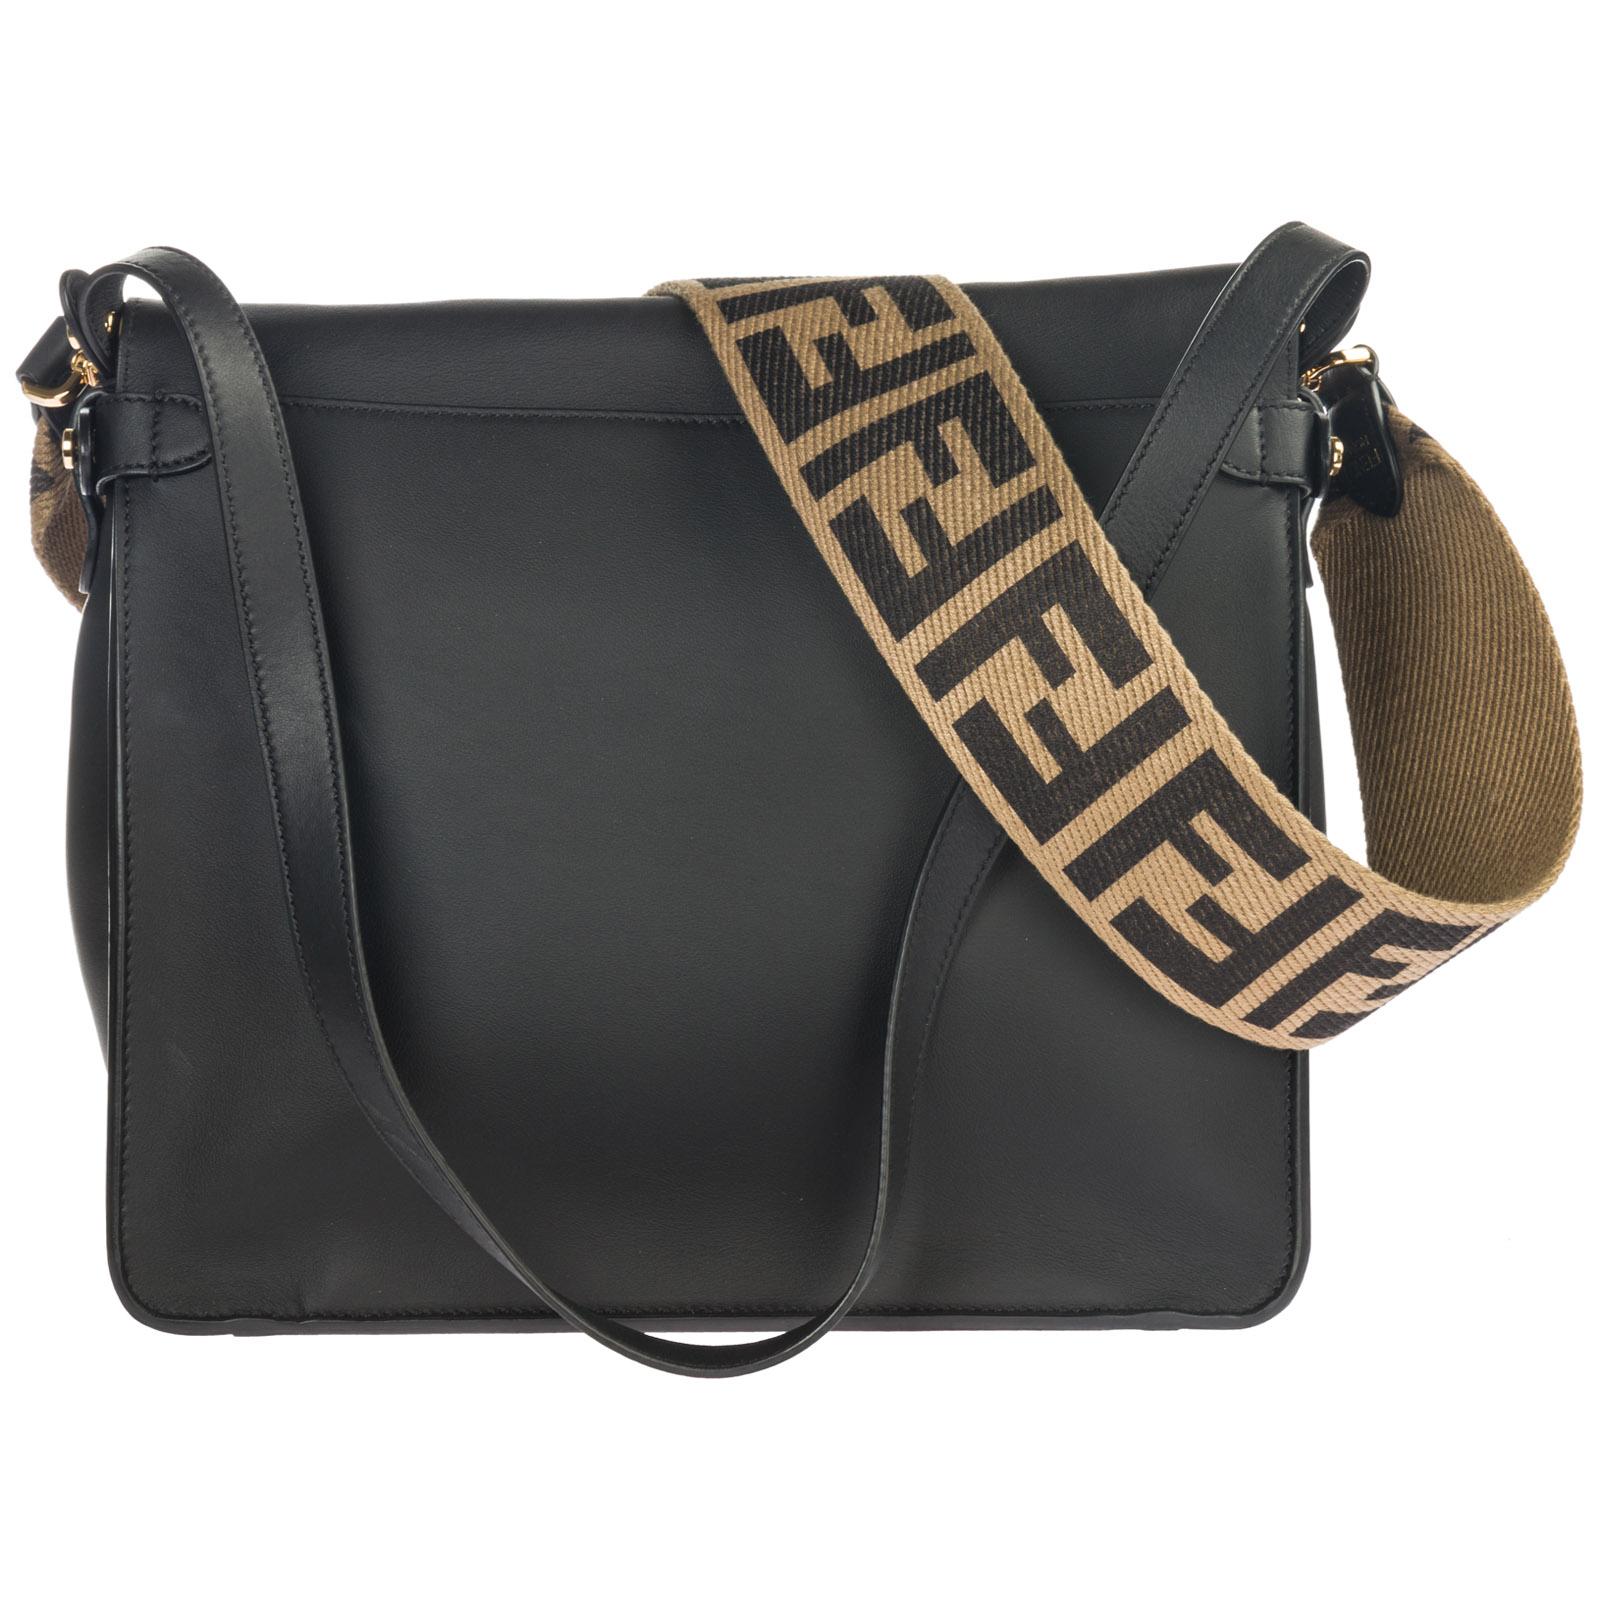 Fendi Women s handbag shopping bag purse tote in pelle flip large ab4b58be61a9a